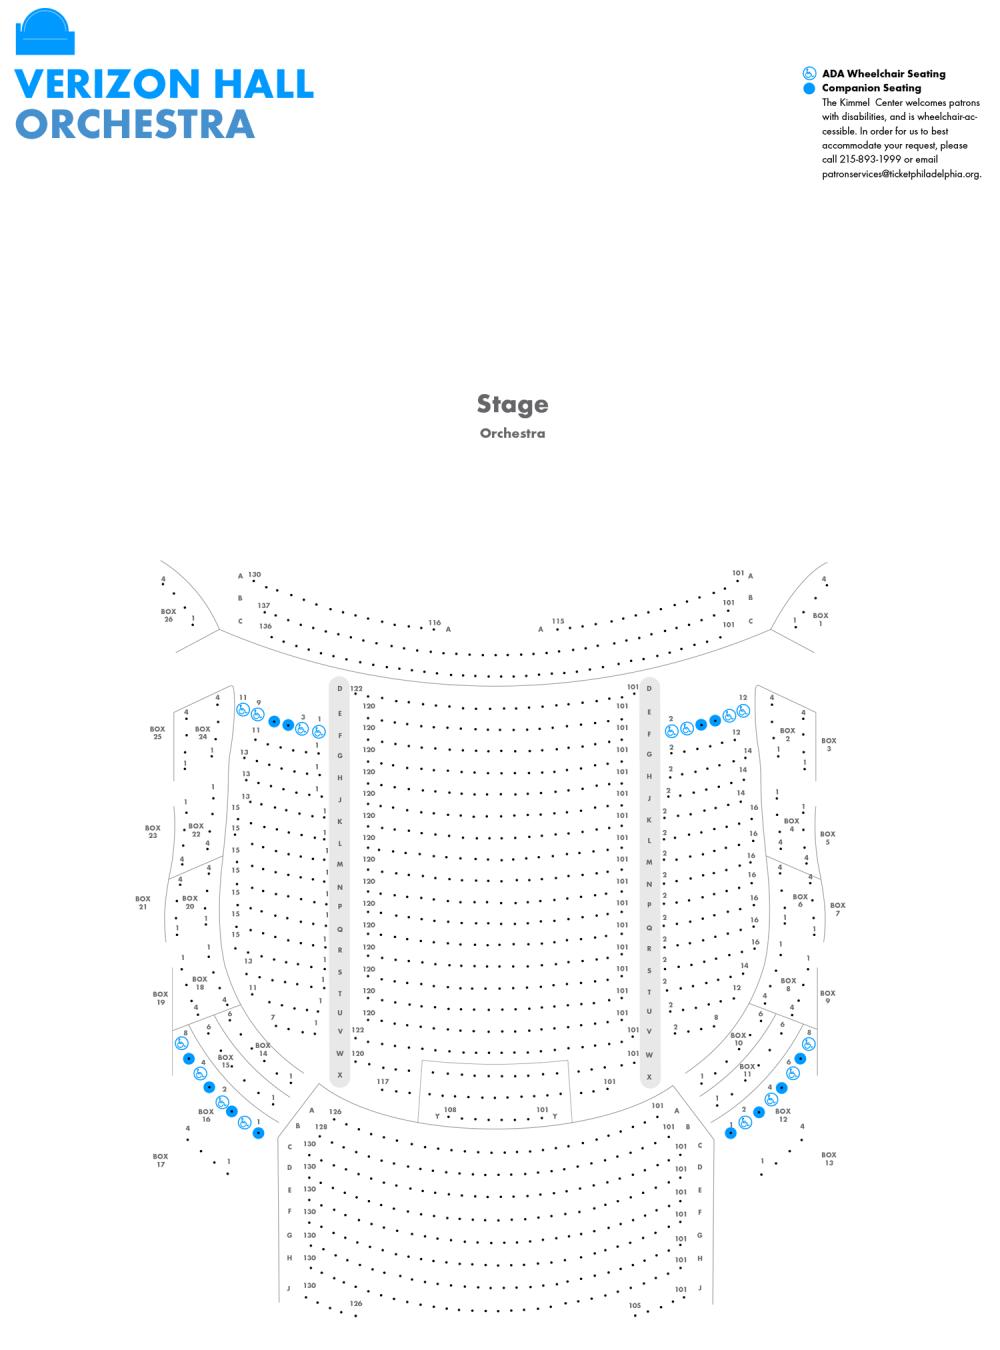 medium resolution of image of verizon hall orchestra level seating chart